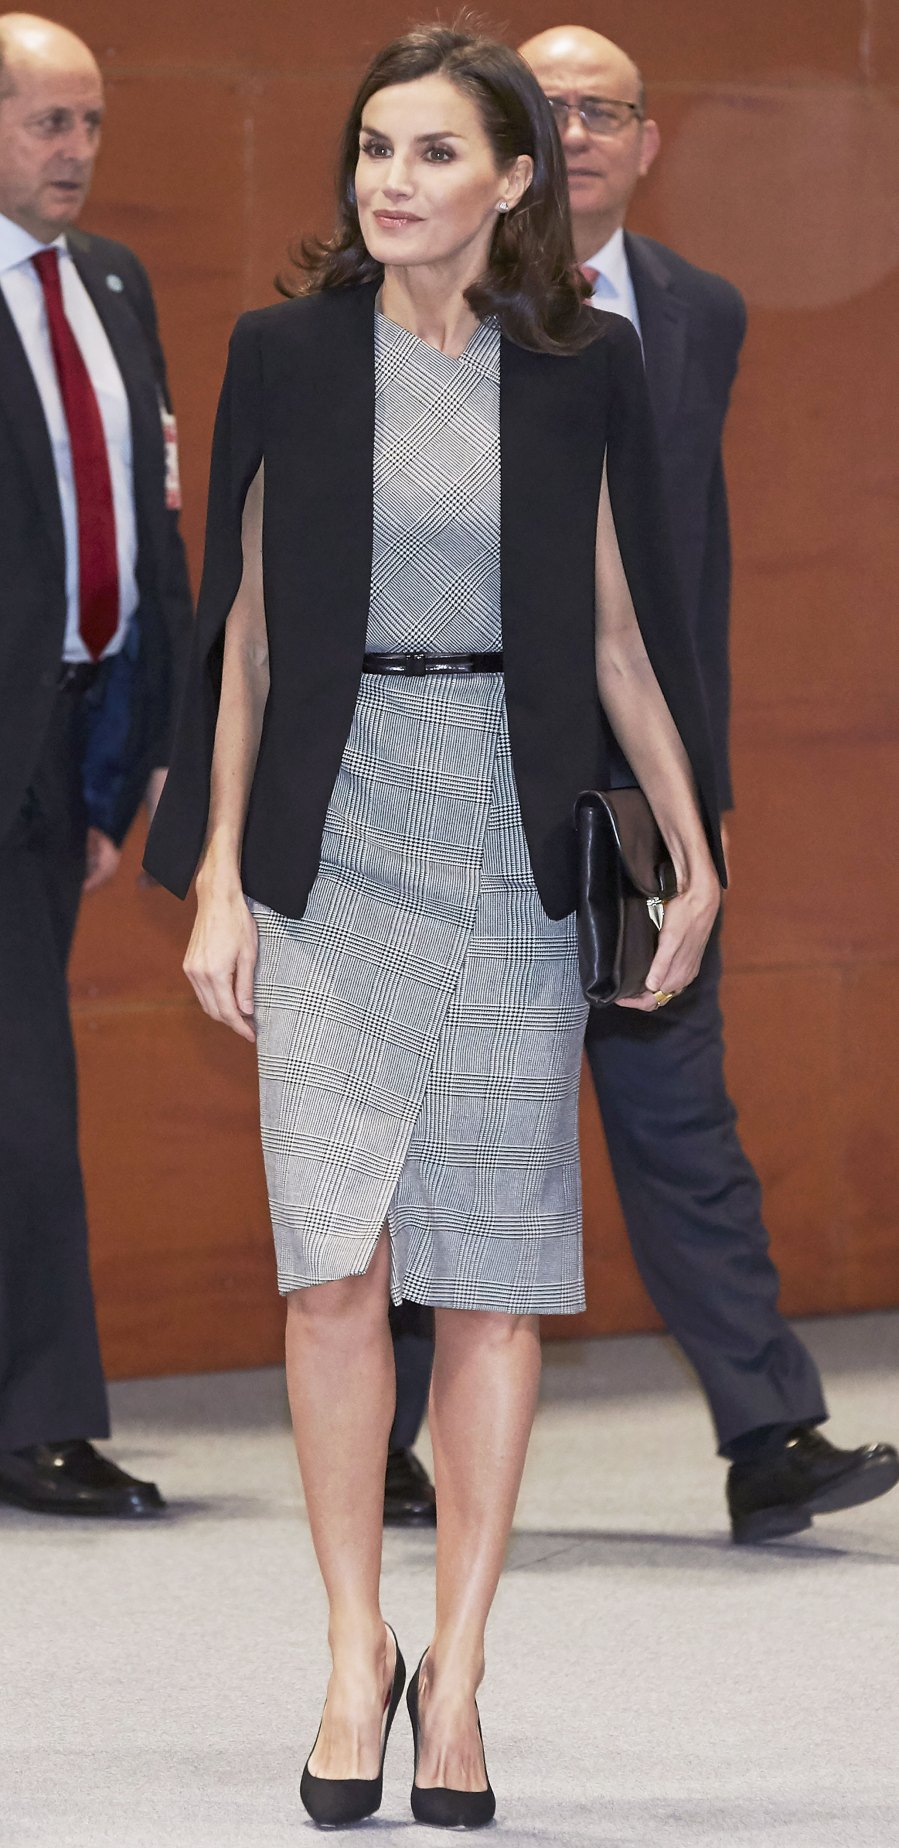 Queen Letizia Plaid Dress December 11, 2019